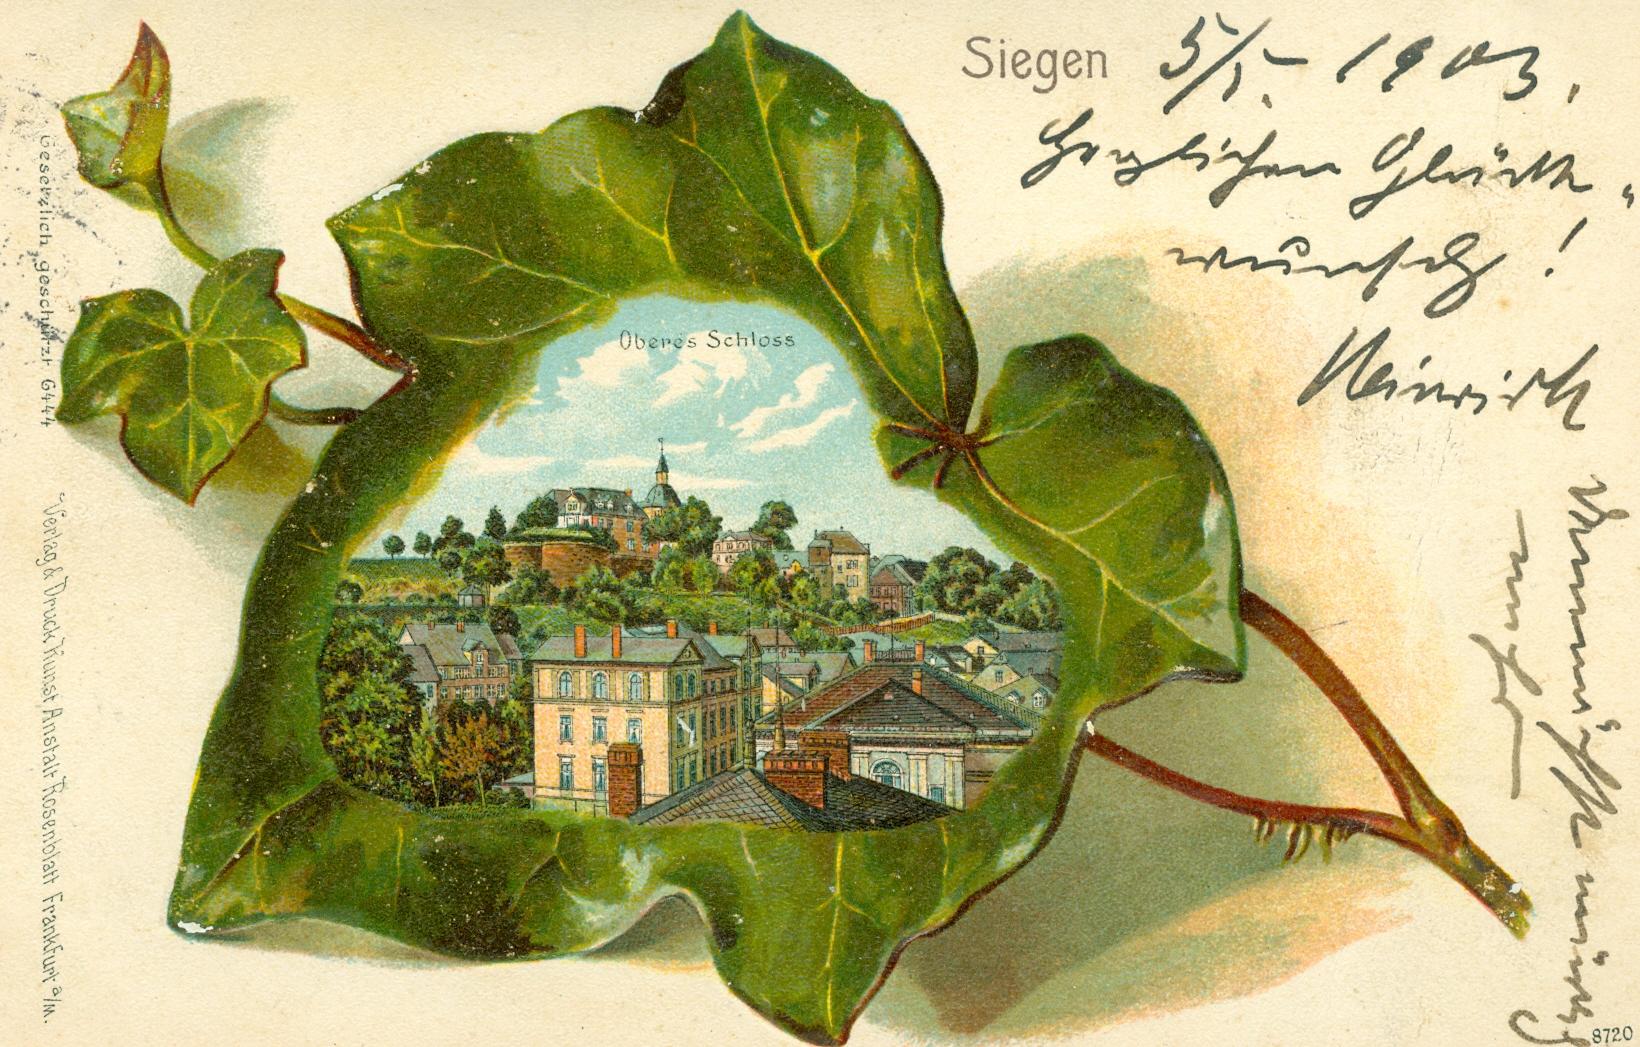 Alte Postkarte. Motiv: Oberes Schloss in Siegen